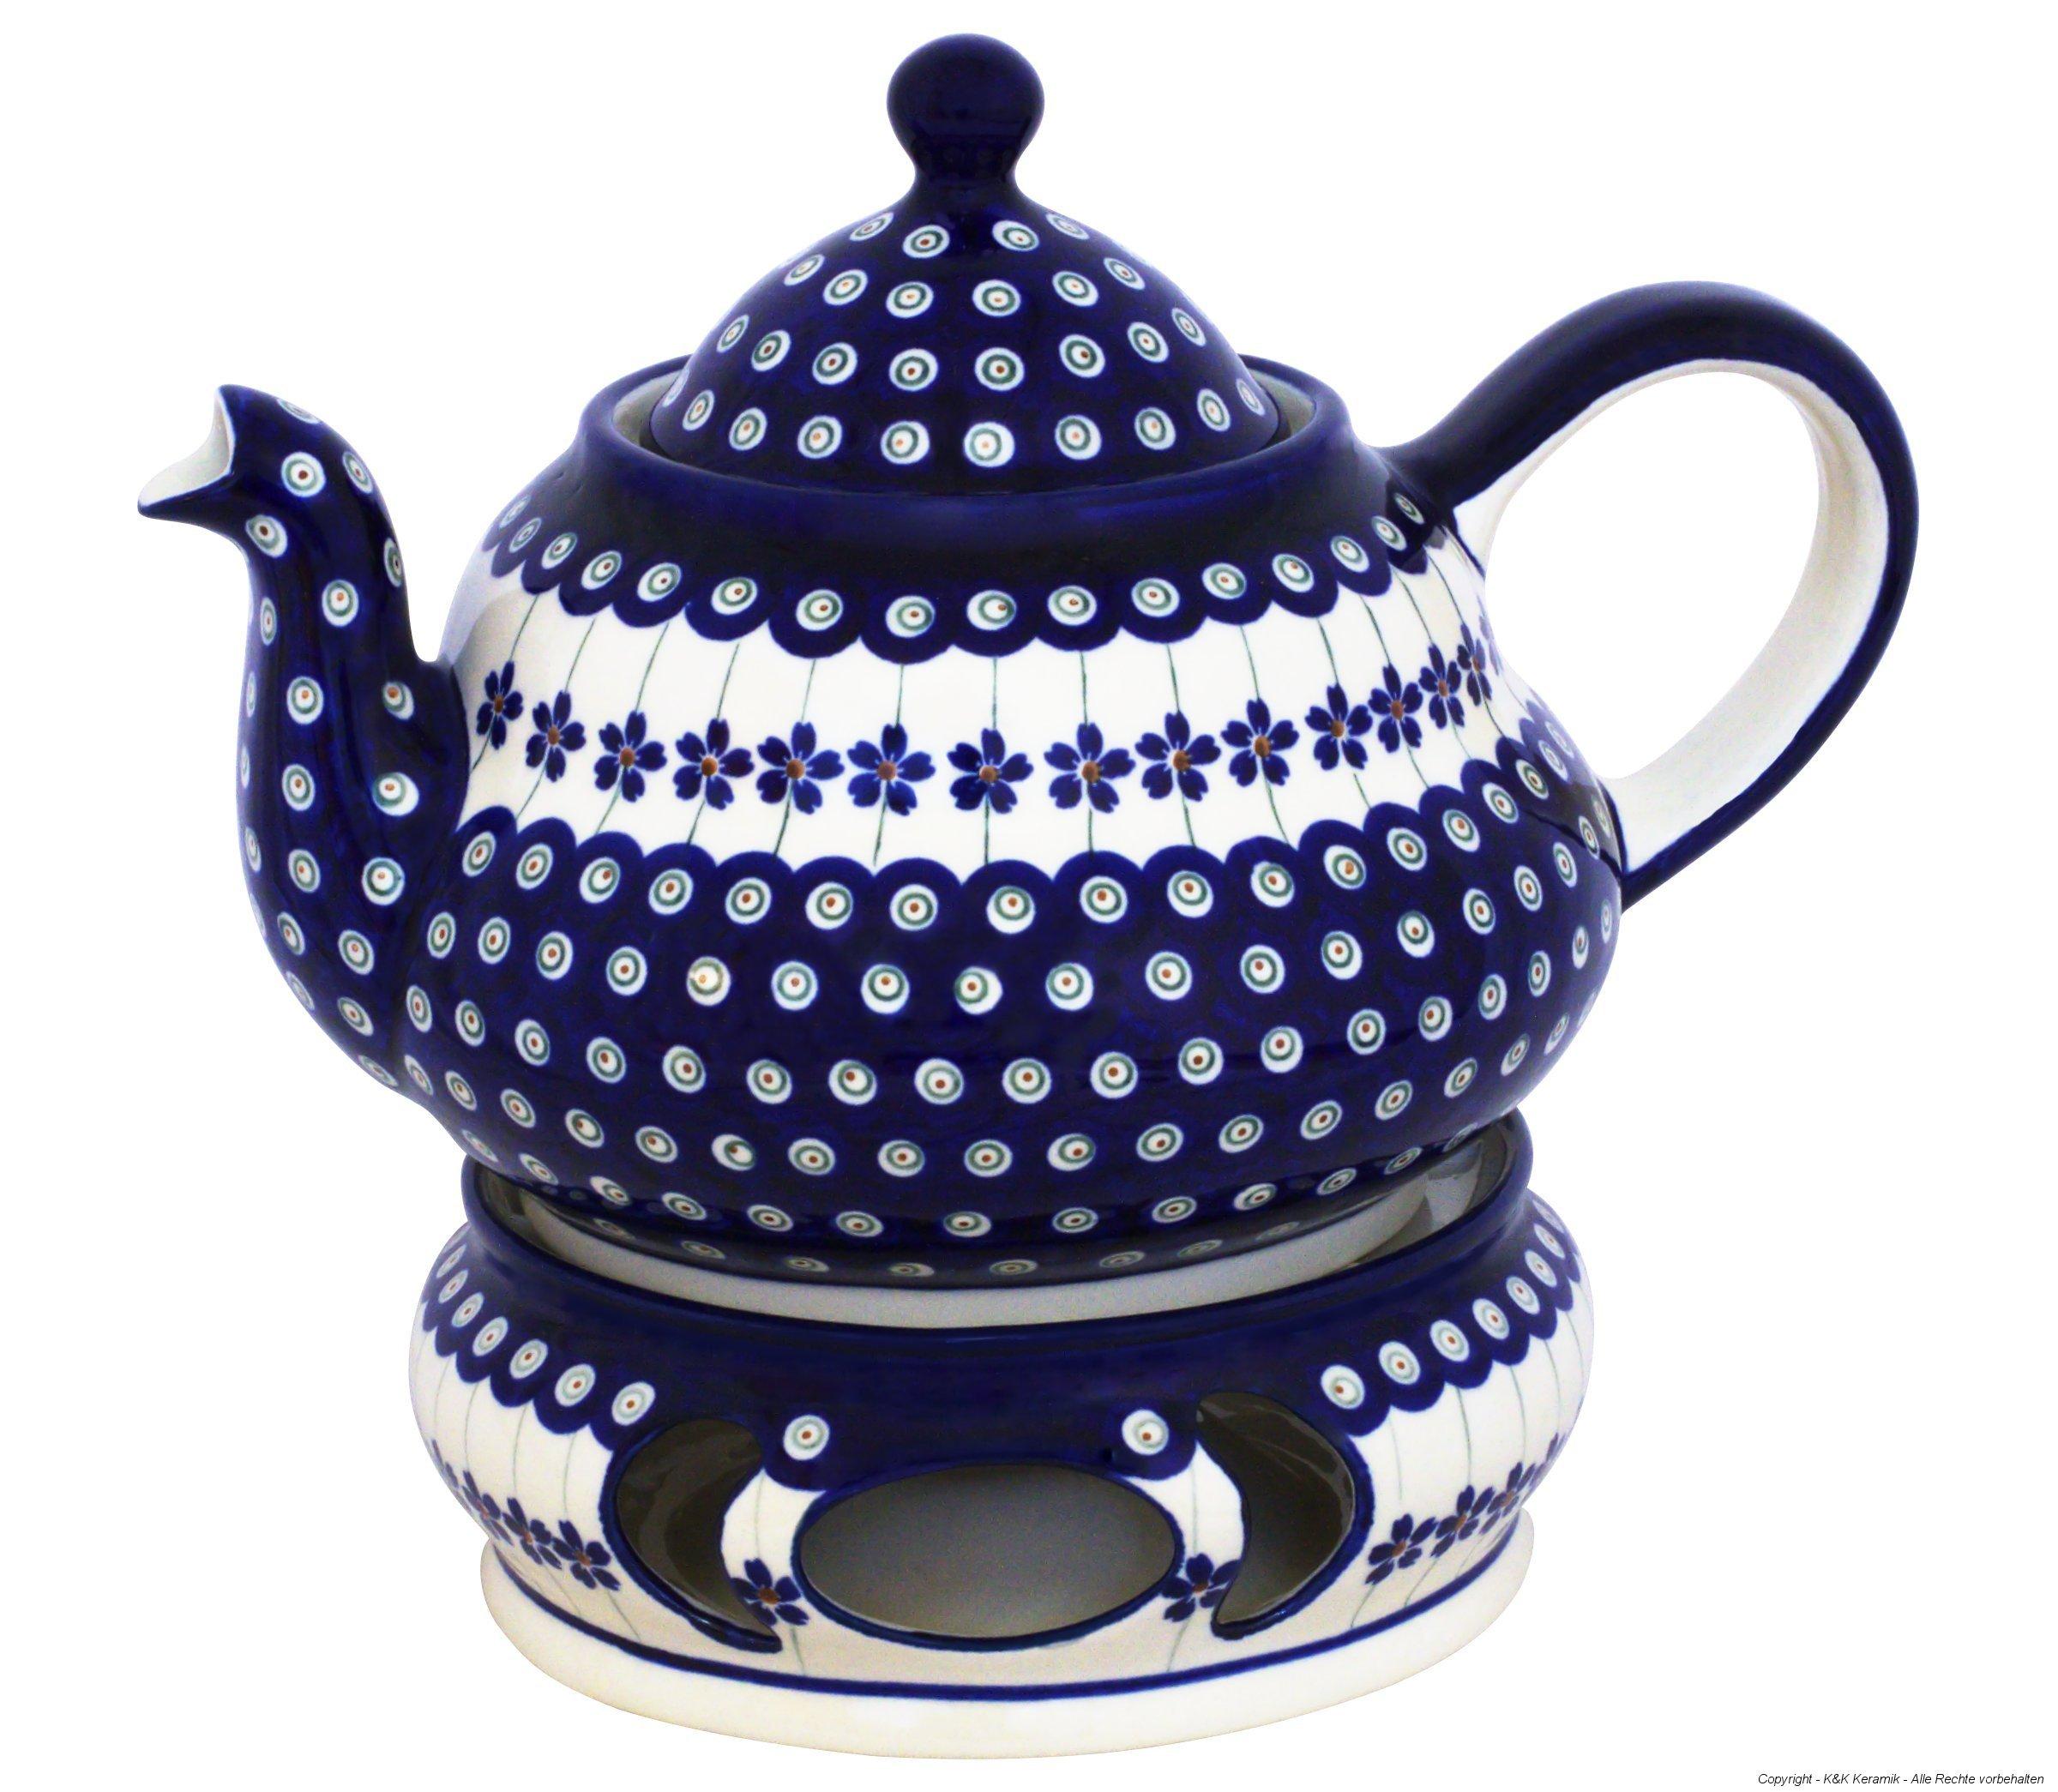 Boleslawiec Pottery Teepot 2.0 L with Warmer, Original Bunzlauer Keramik, Decor 166a